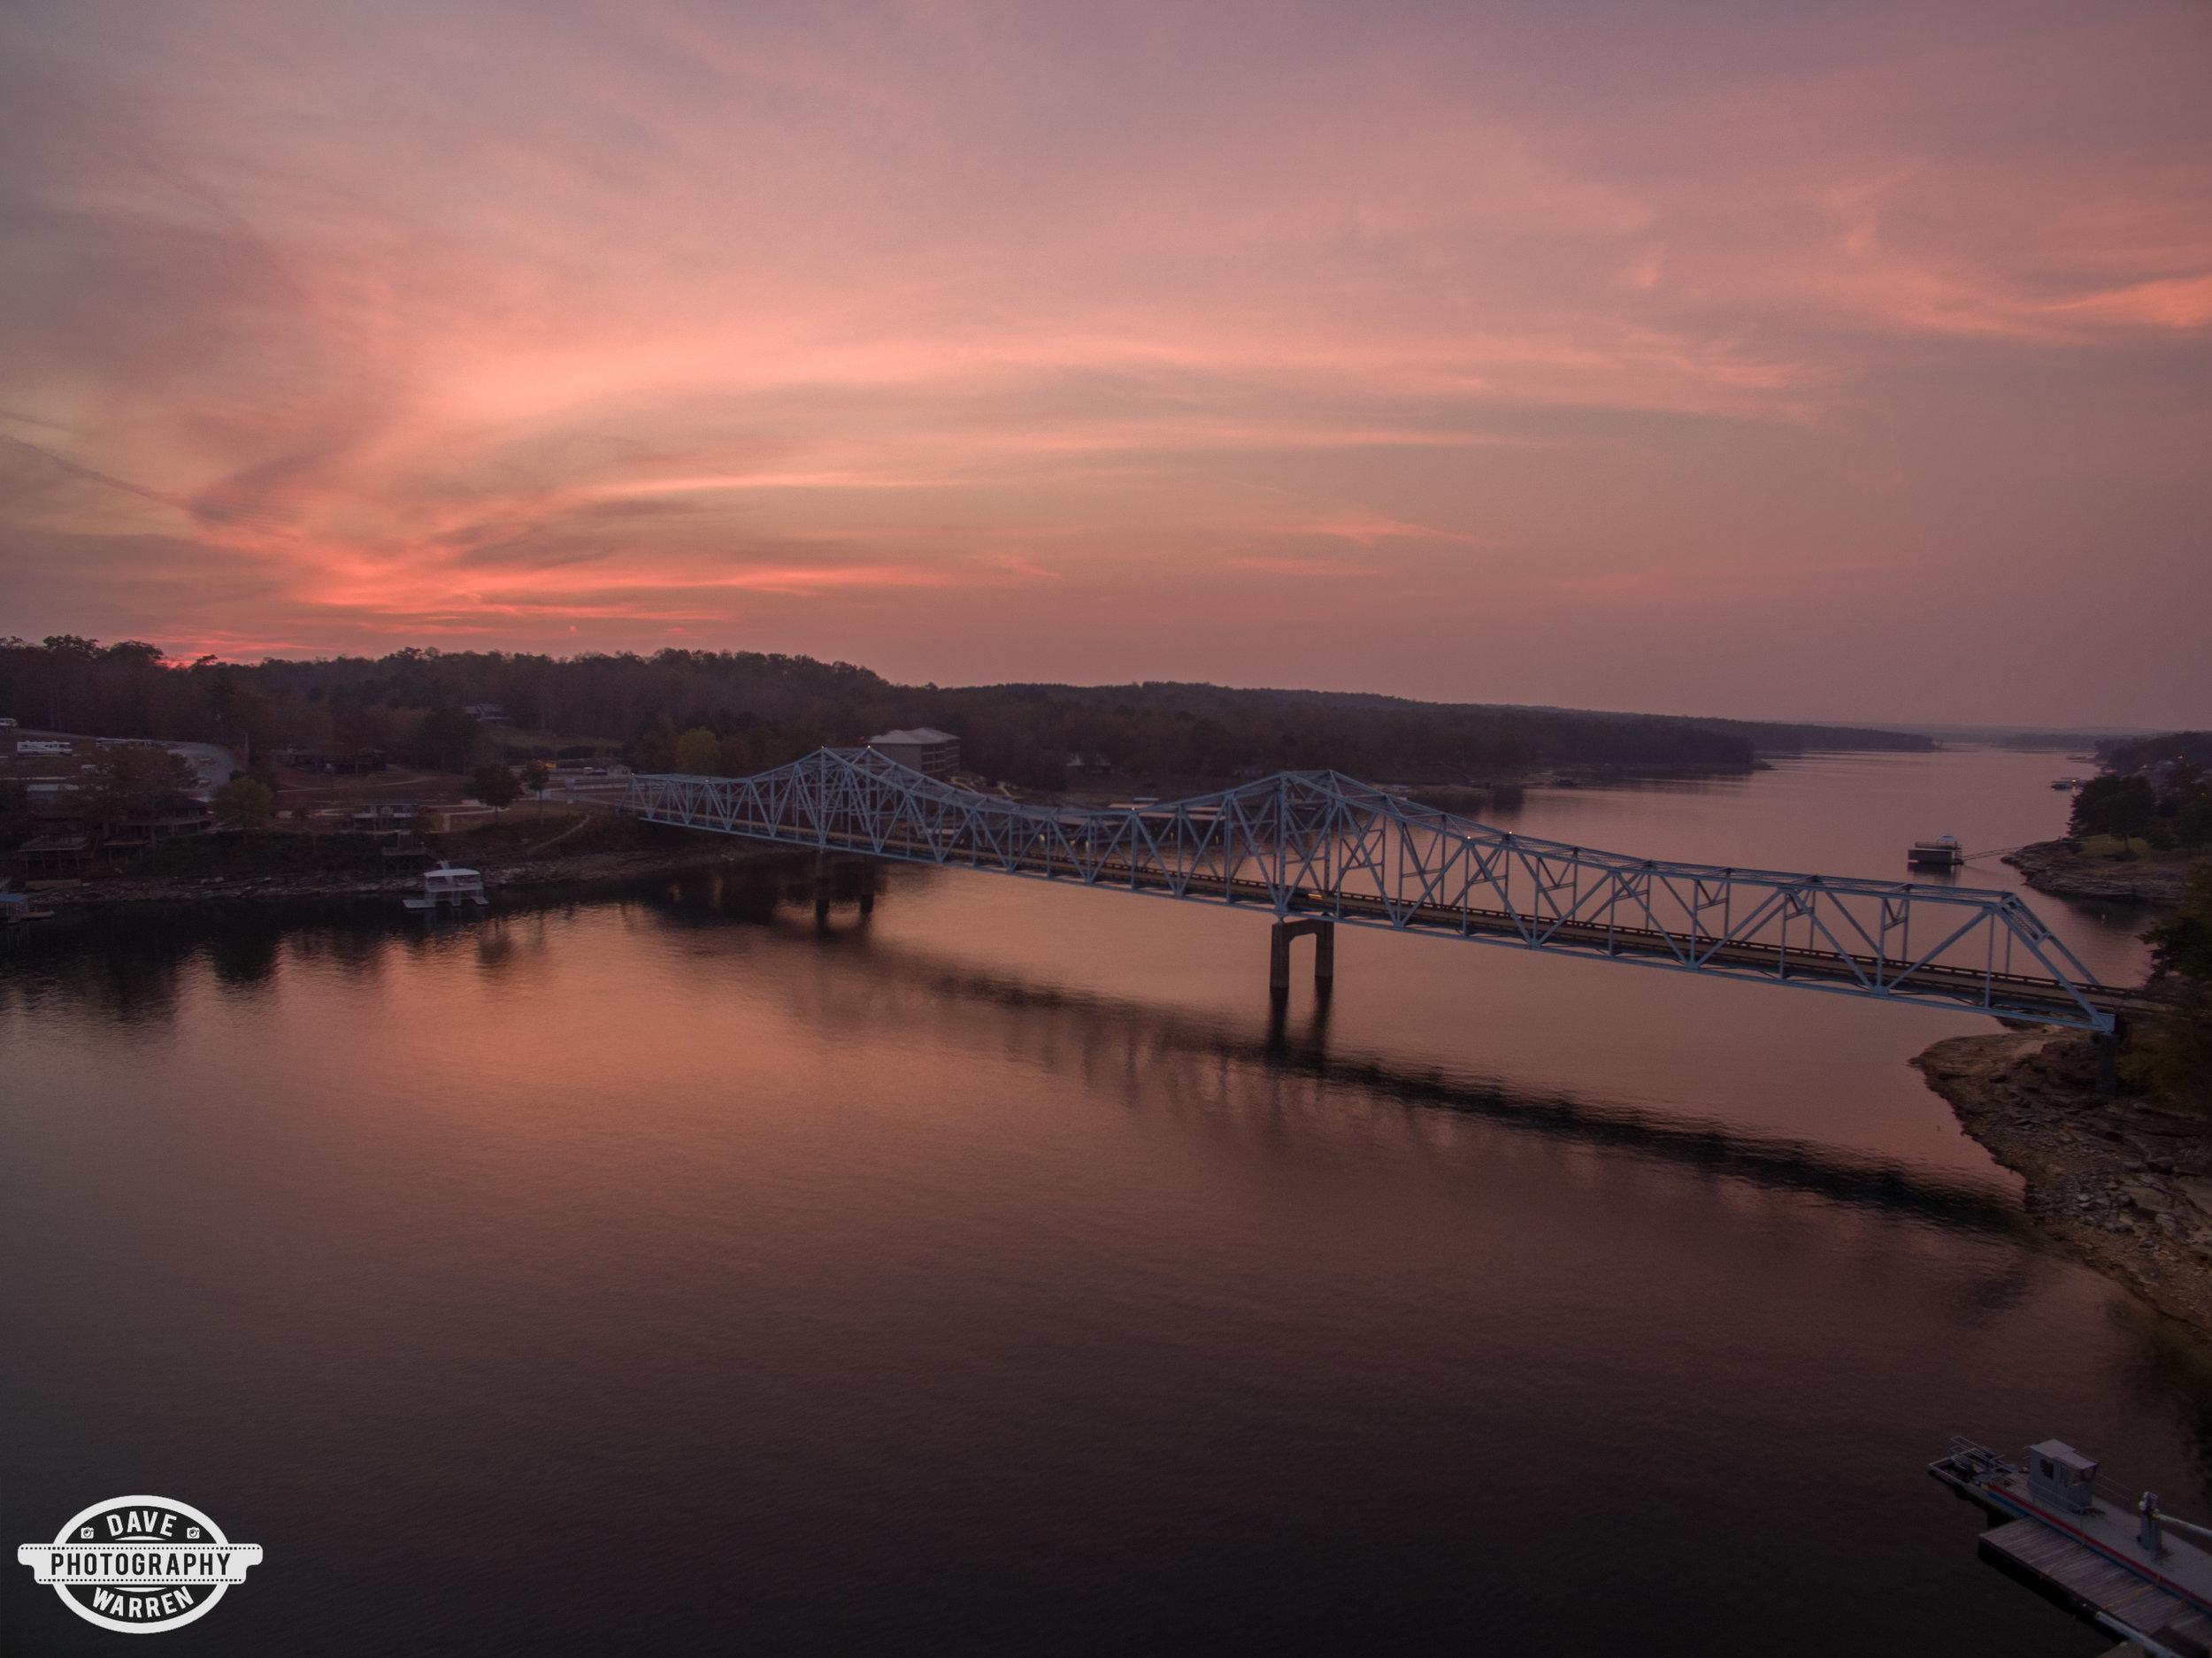 dave-warren-cullman-aerial-photography-duncan-bridge-.jpg